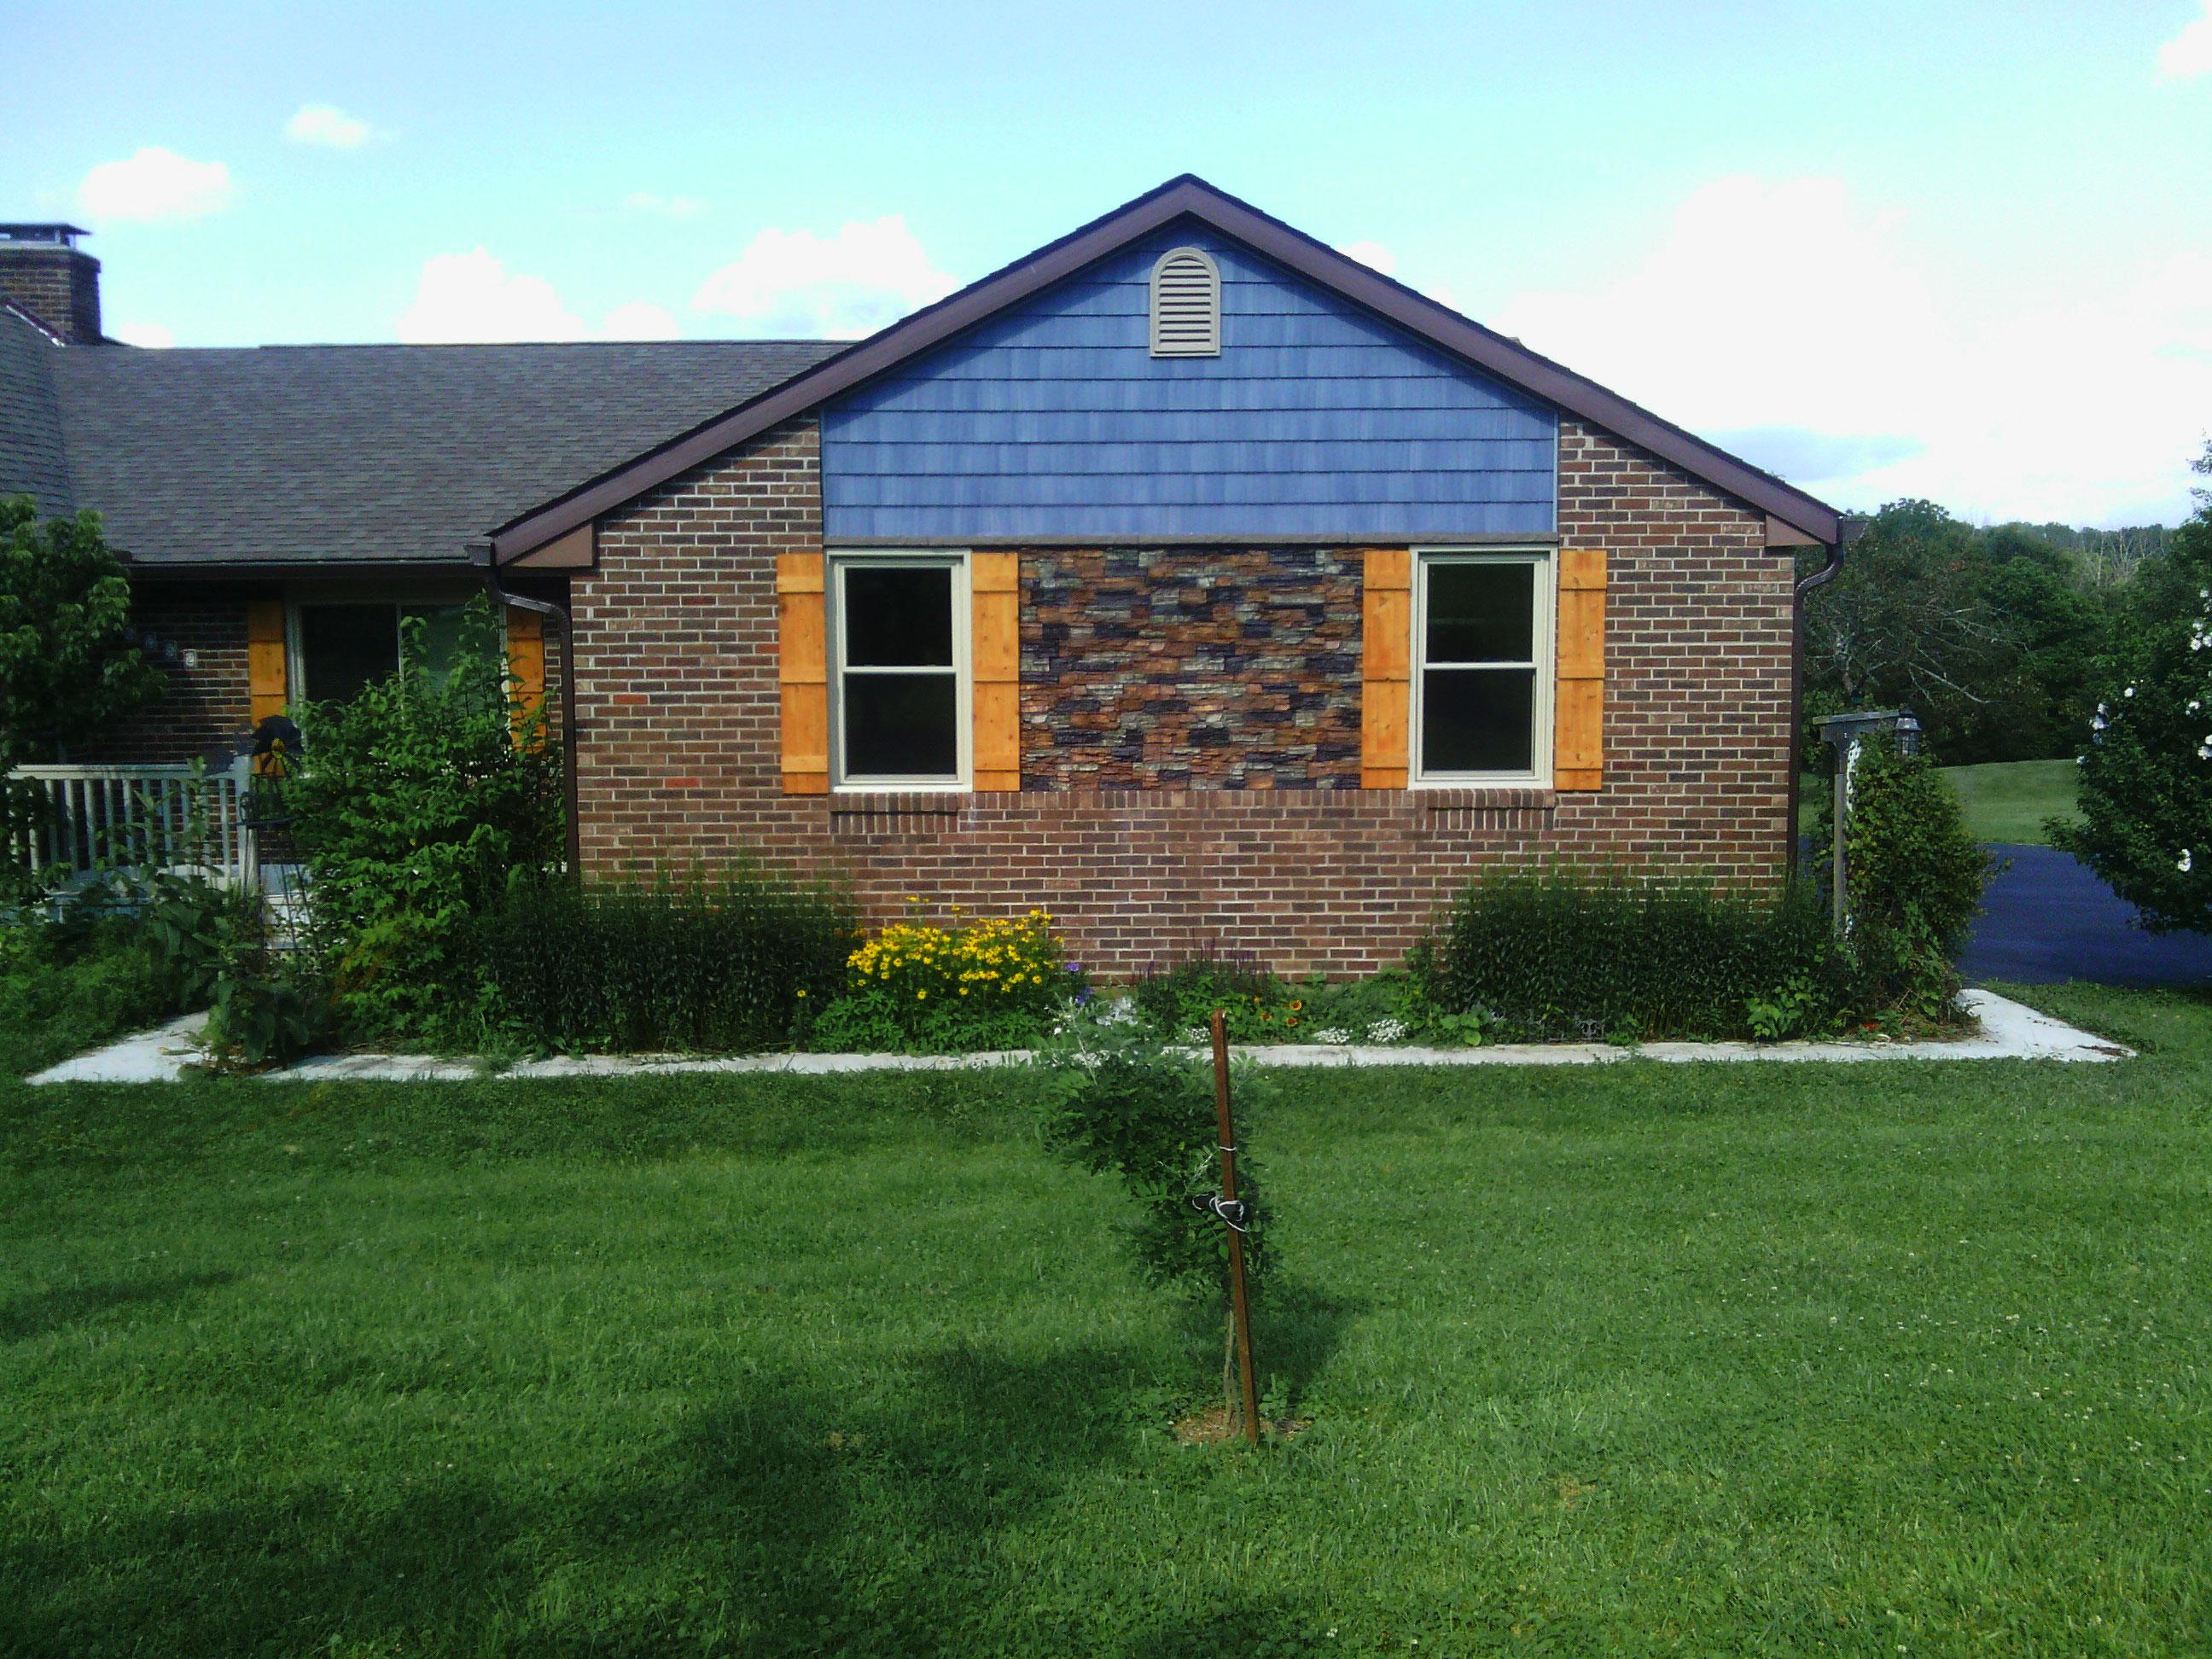 Endurathane Stacked Stone Panels On Ohio Home